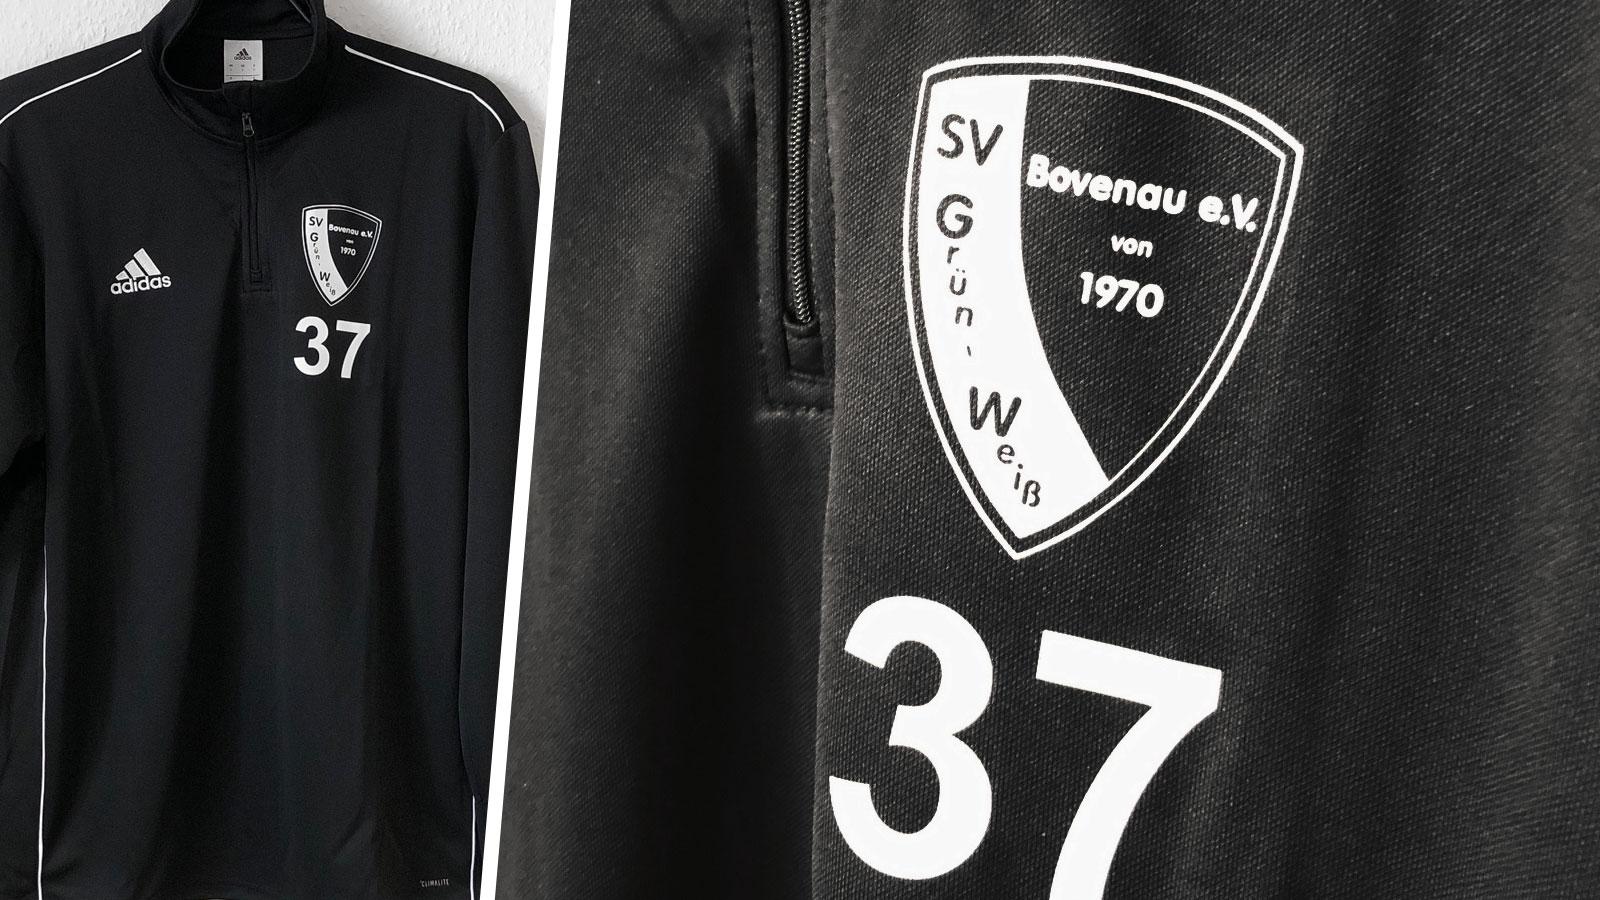 adidas trainingstop mit SV Grün Weiß Bovenau Intro